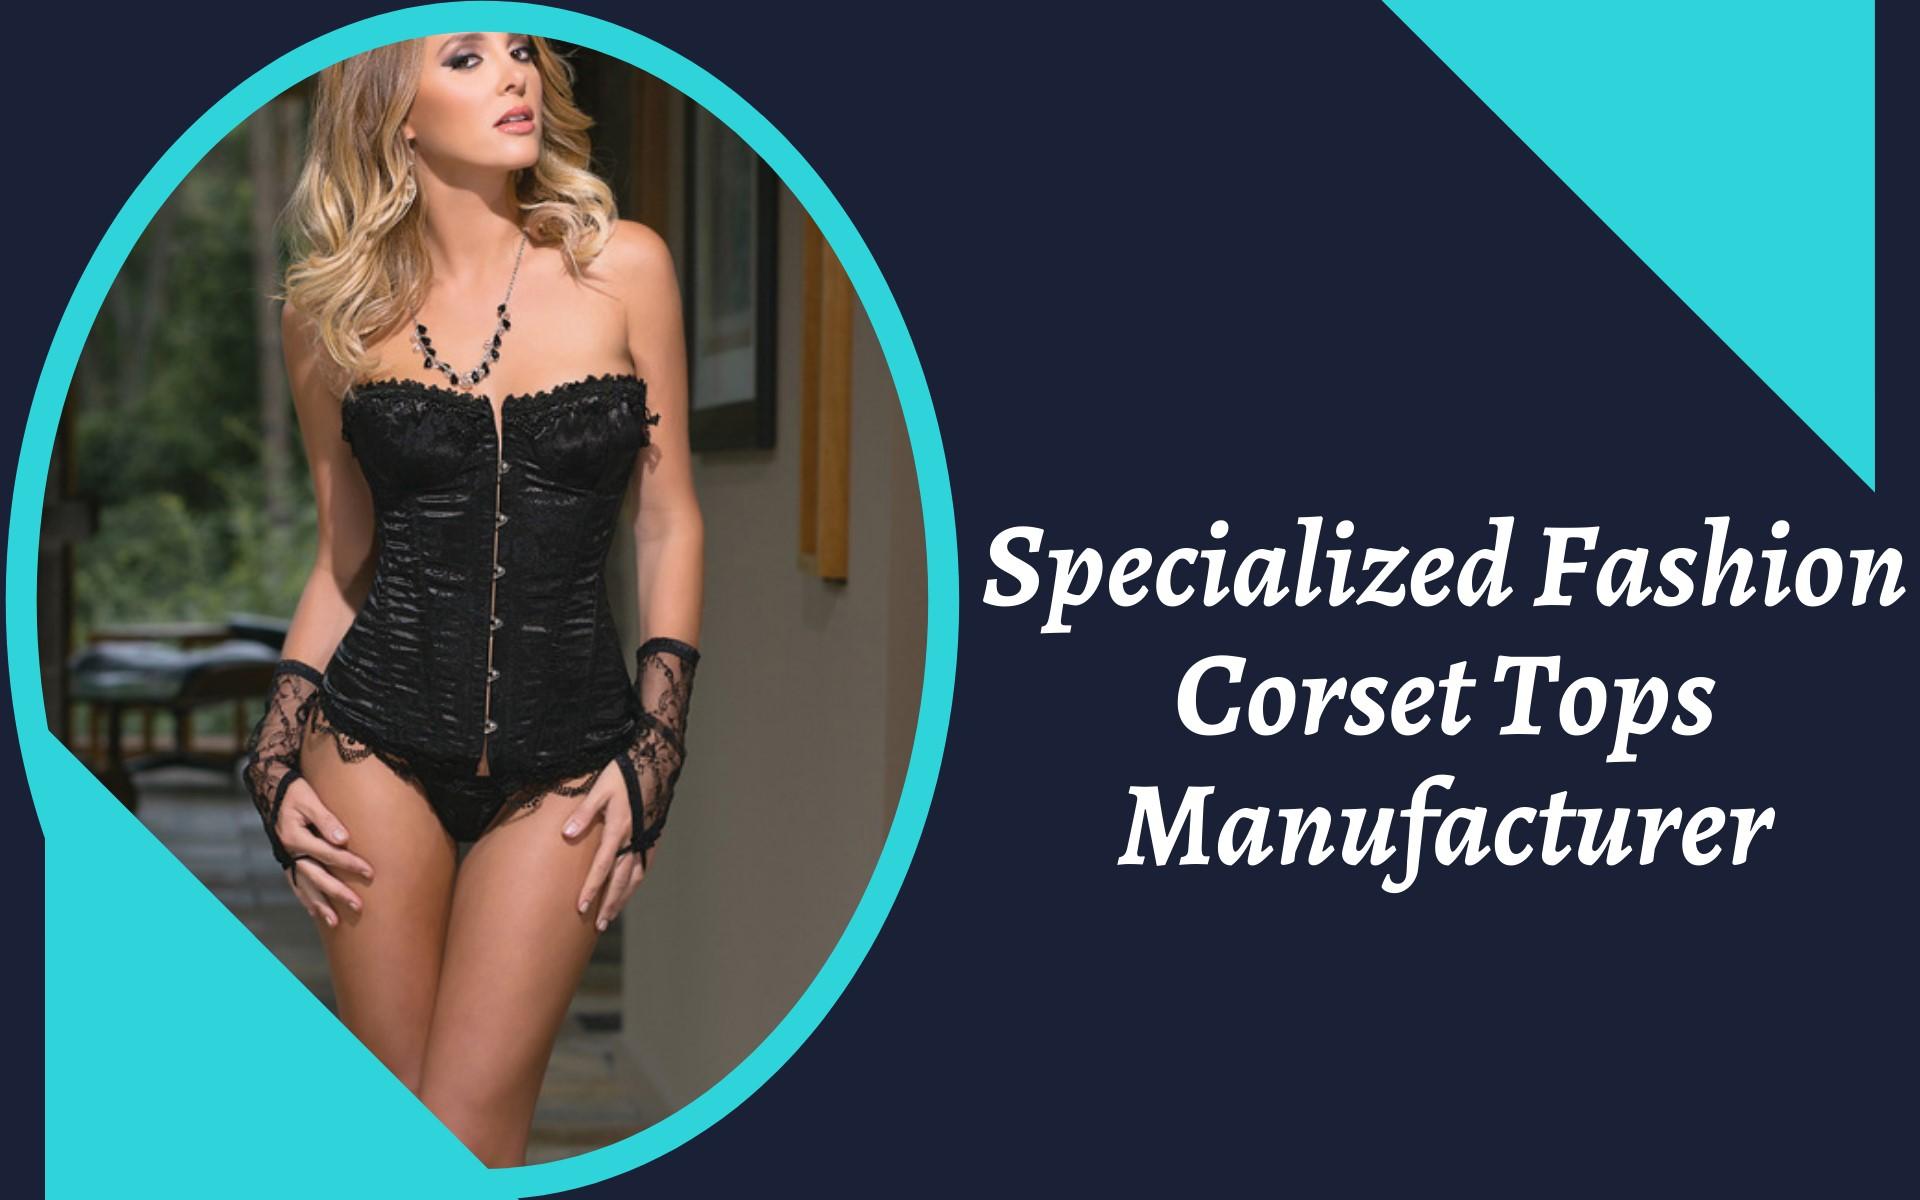 Fashion Corset Tops Manufacturer